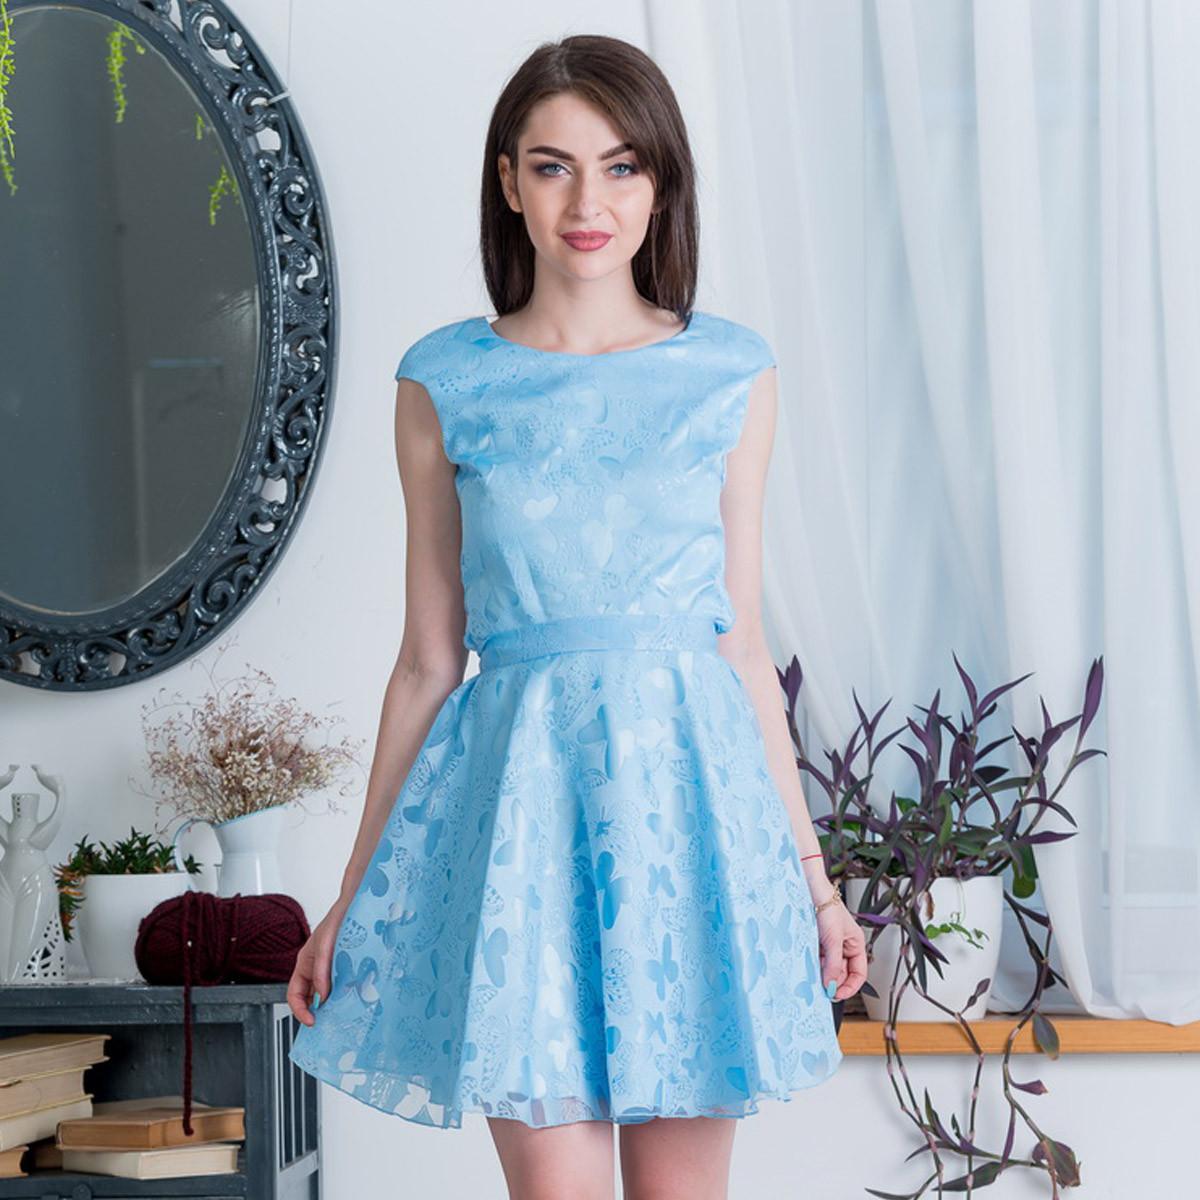 c2e4f77e6ac Голубое короткое платье на праздник